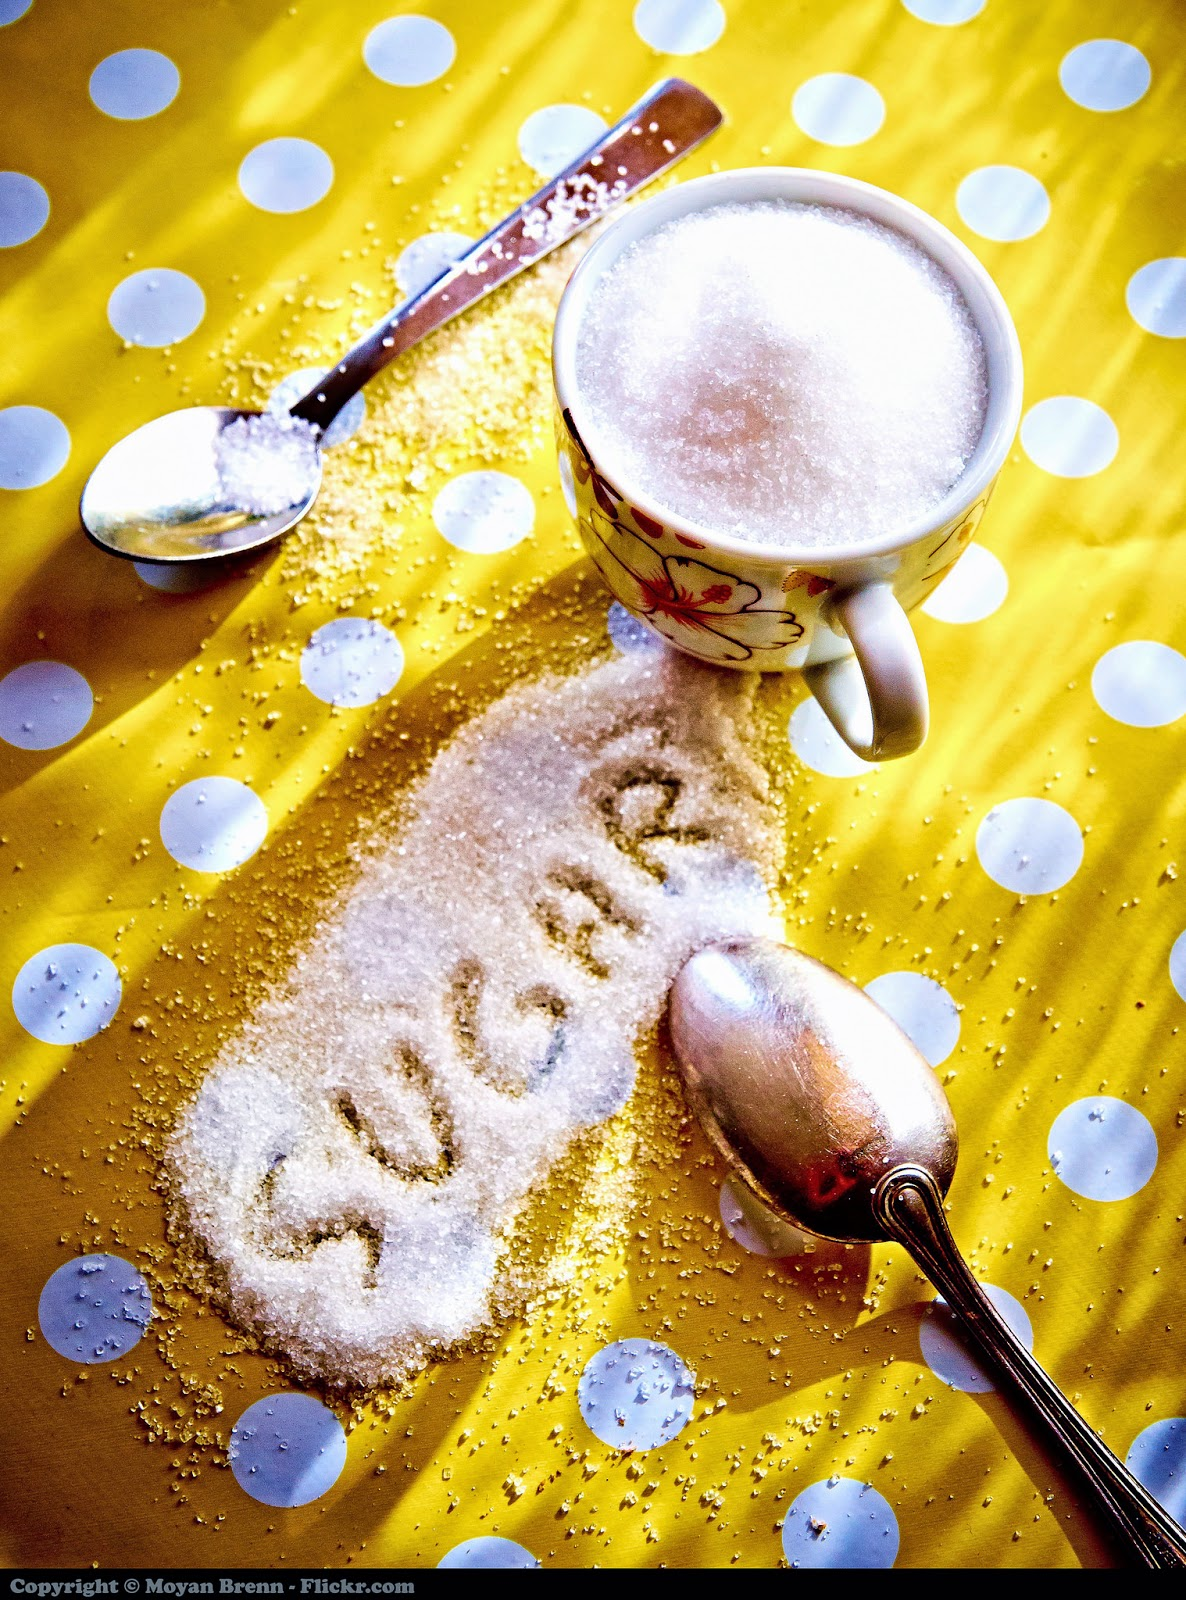 анализы при сахарном диабете